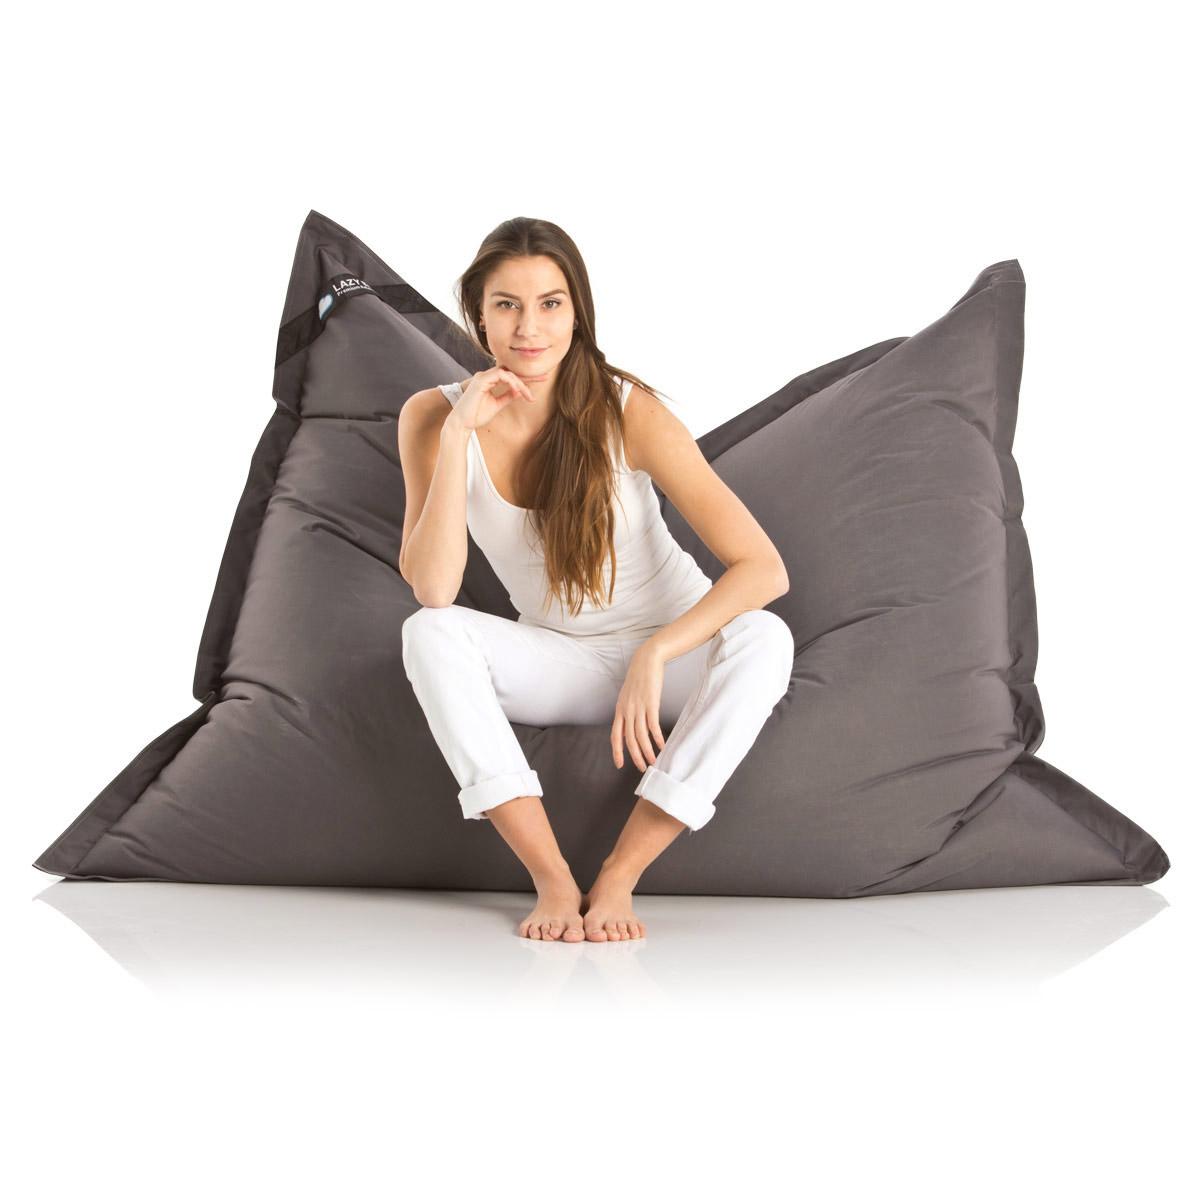 lazybag sitzsack wasserfestes xxl sitzkissen. Black Bedroom Furniture Sets. Home Design Ideas